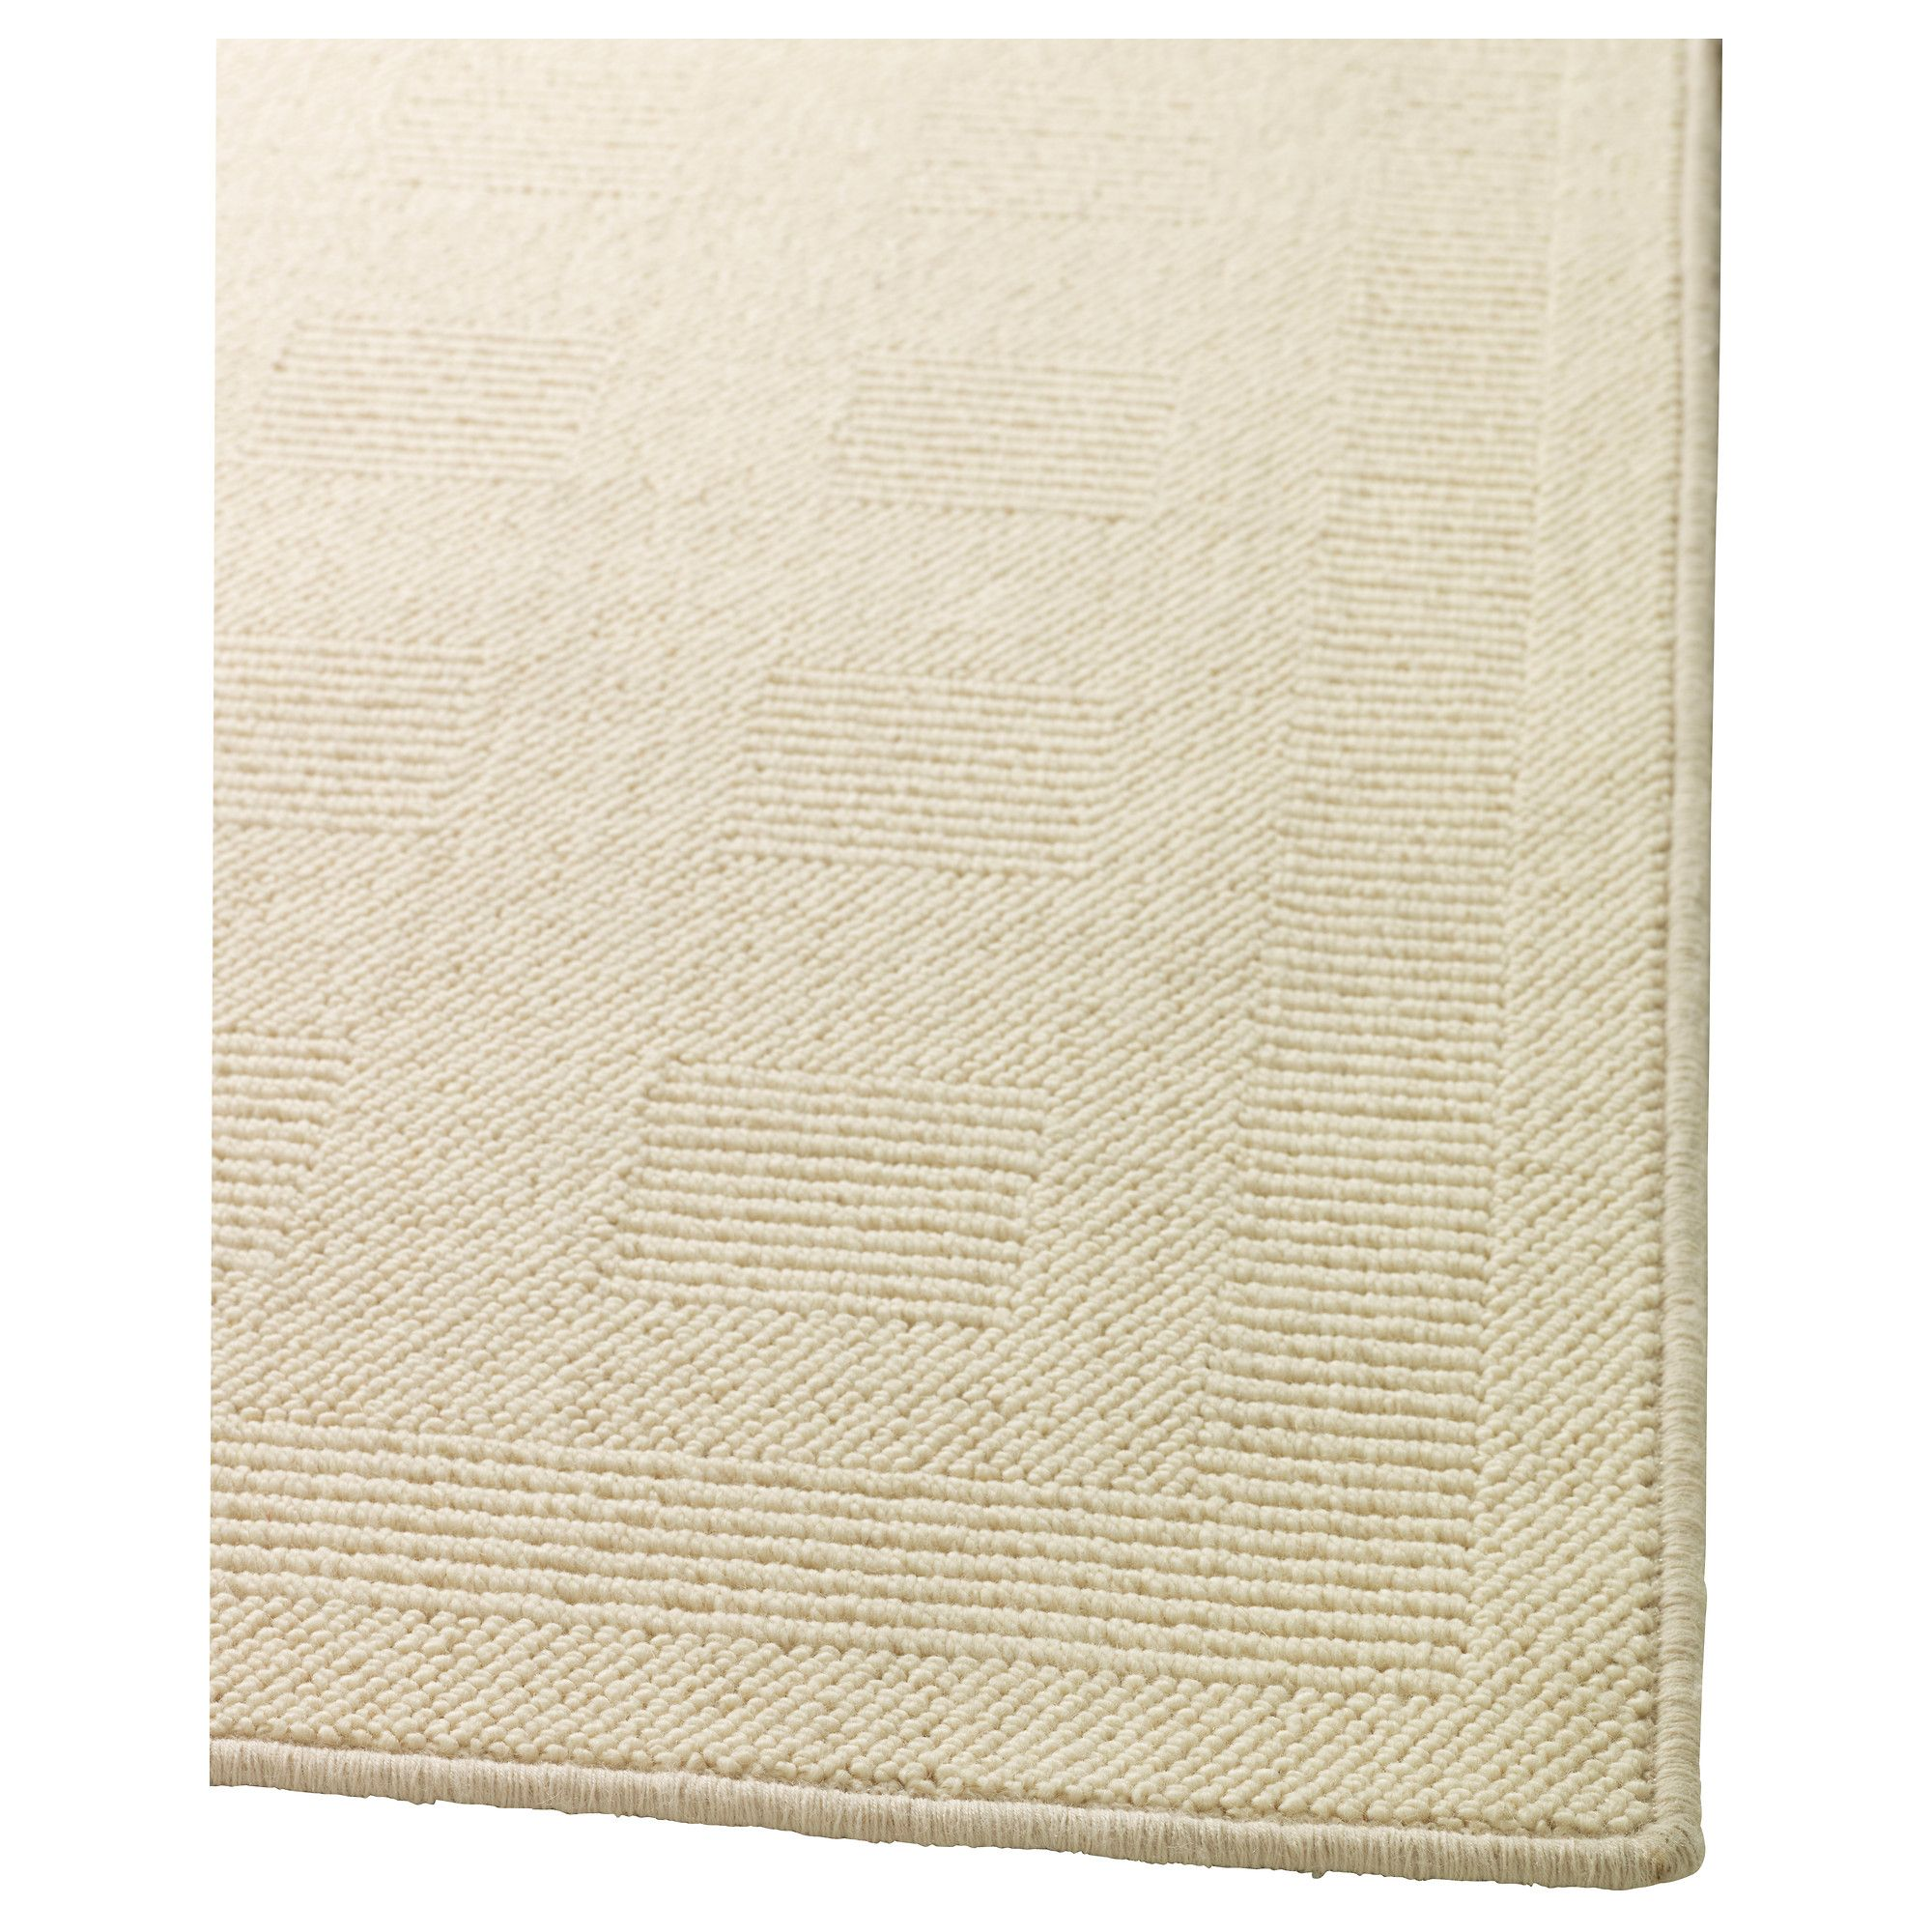 ikea white shag rug. HAVBRO Vloerkleed, Laagpolig - 200x300 Cm IKEA Ikea White Shag Rug H